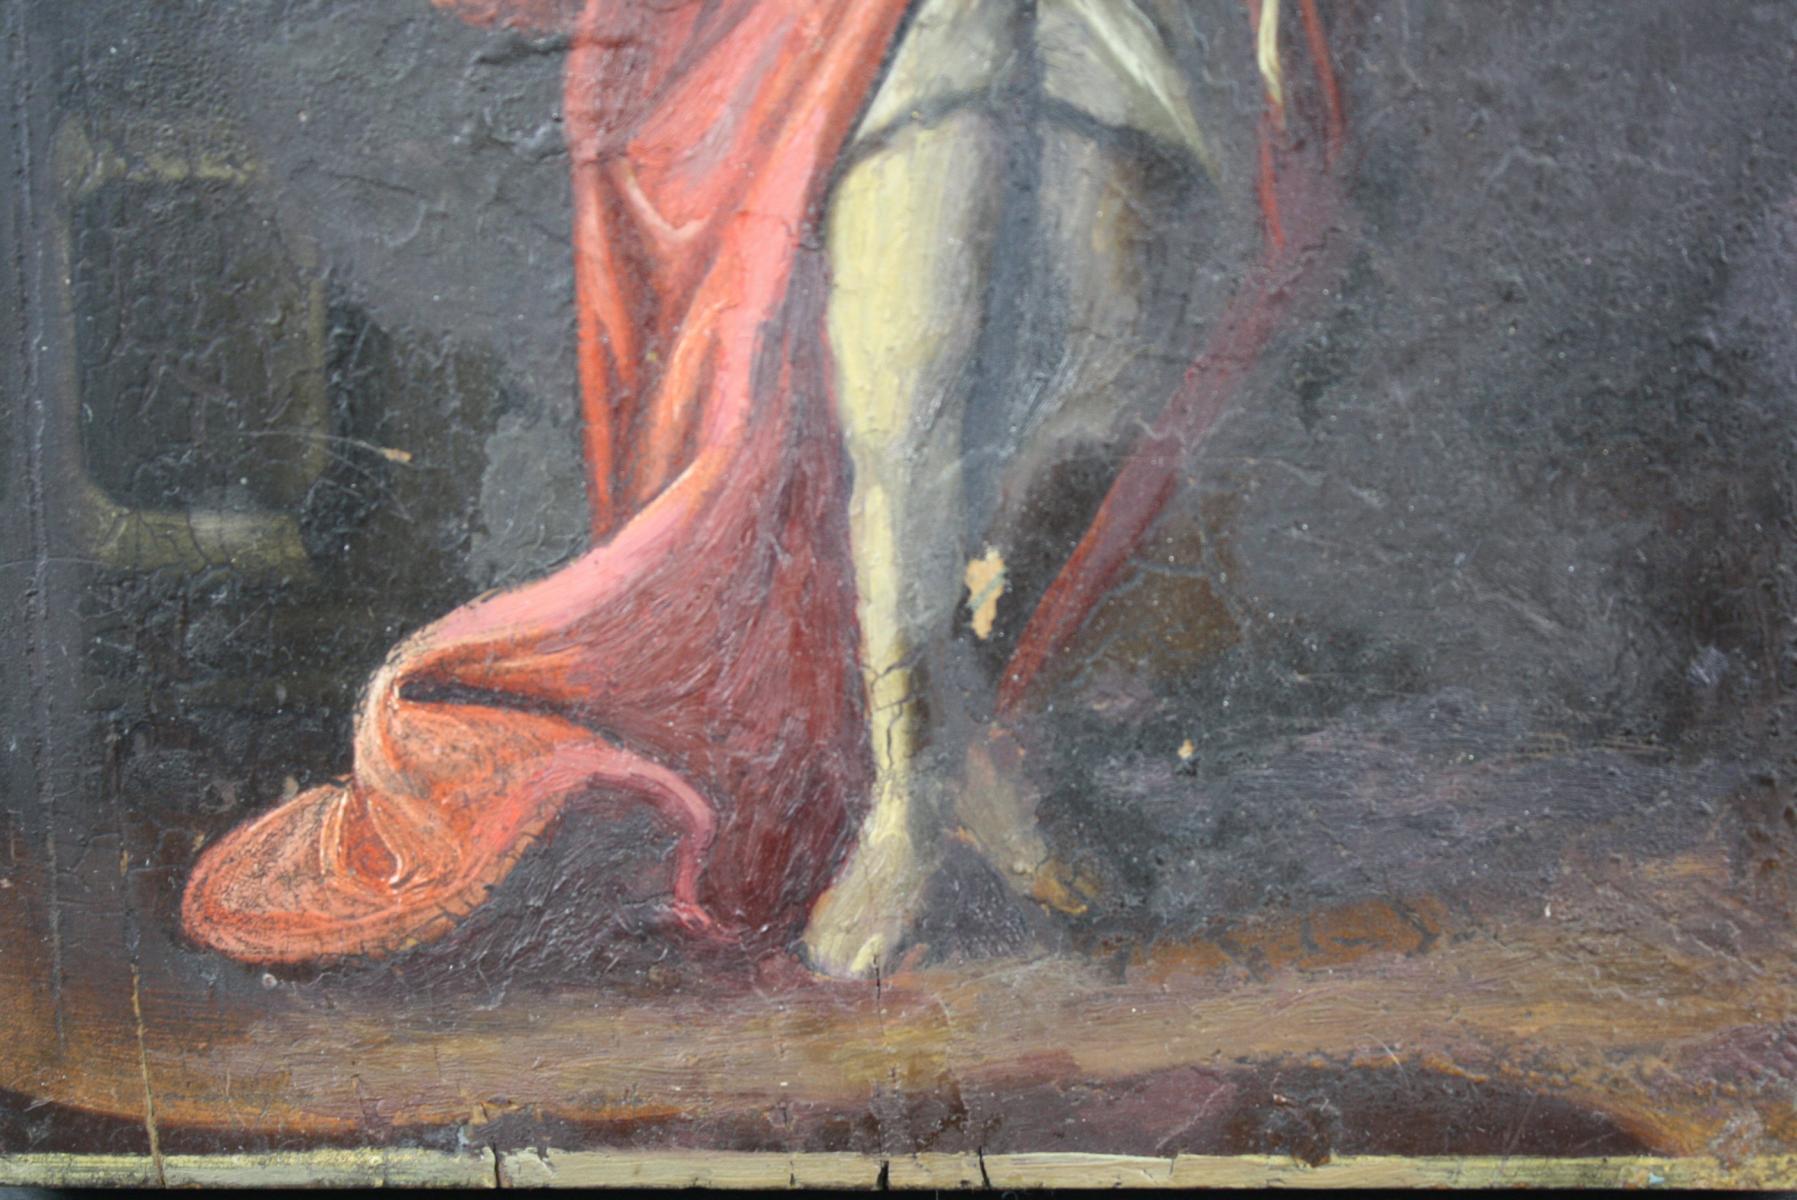 Ikone, Hl. Johannes der Täufer-4